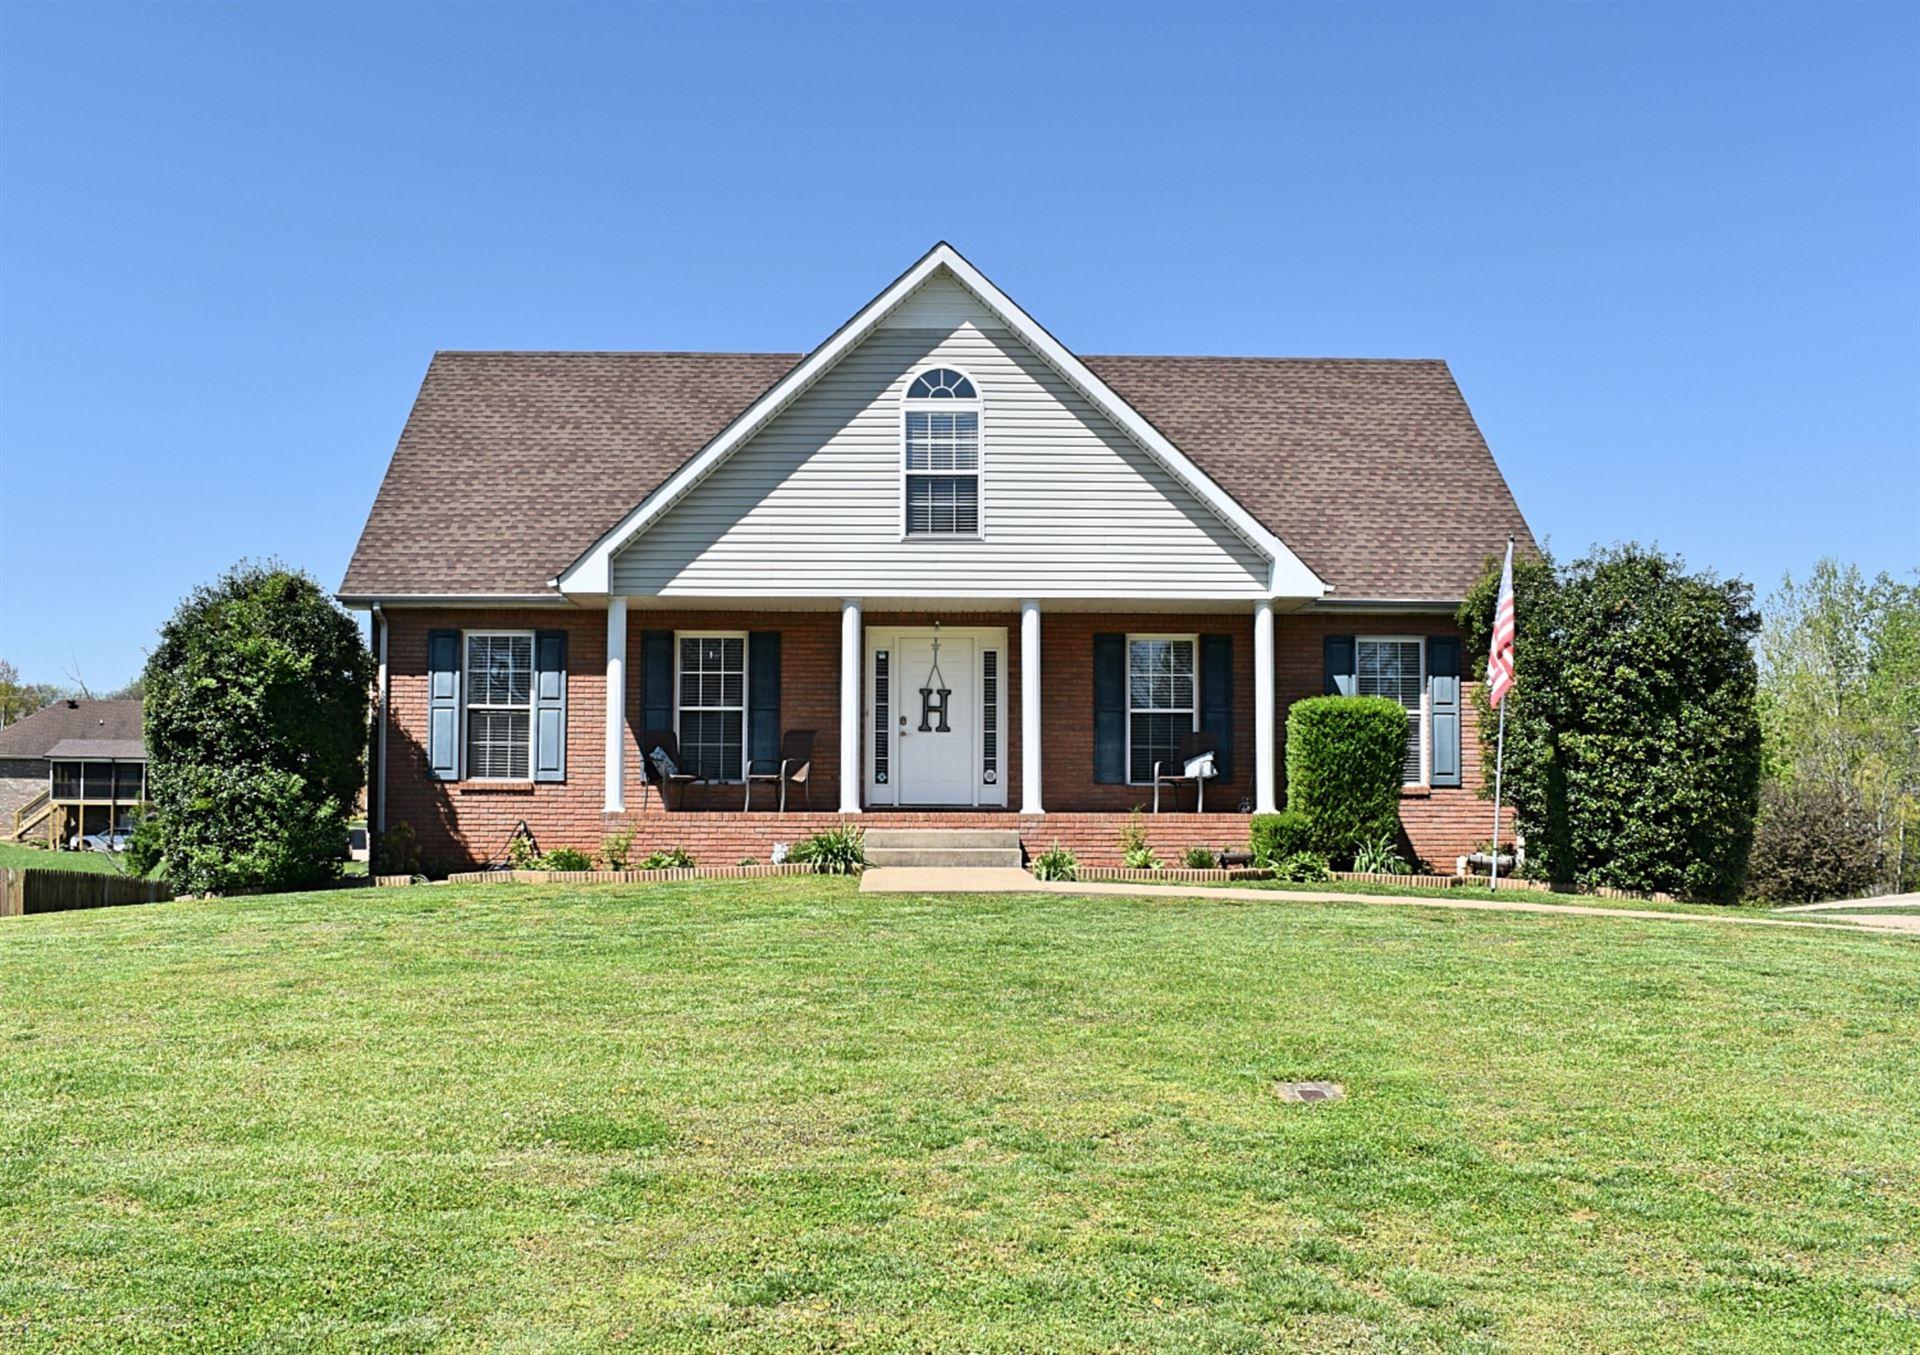 1157 Thornberry Drive, Clarksville, TN 37043 - MLS#: 2244694